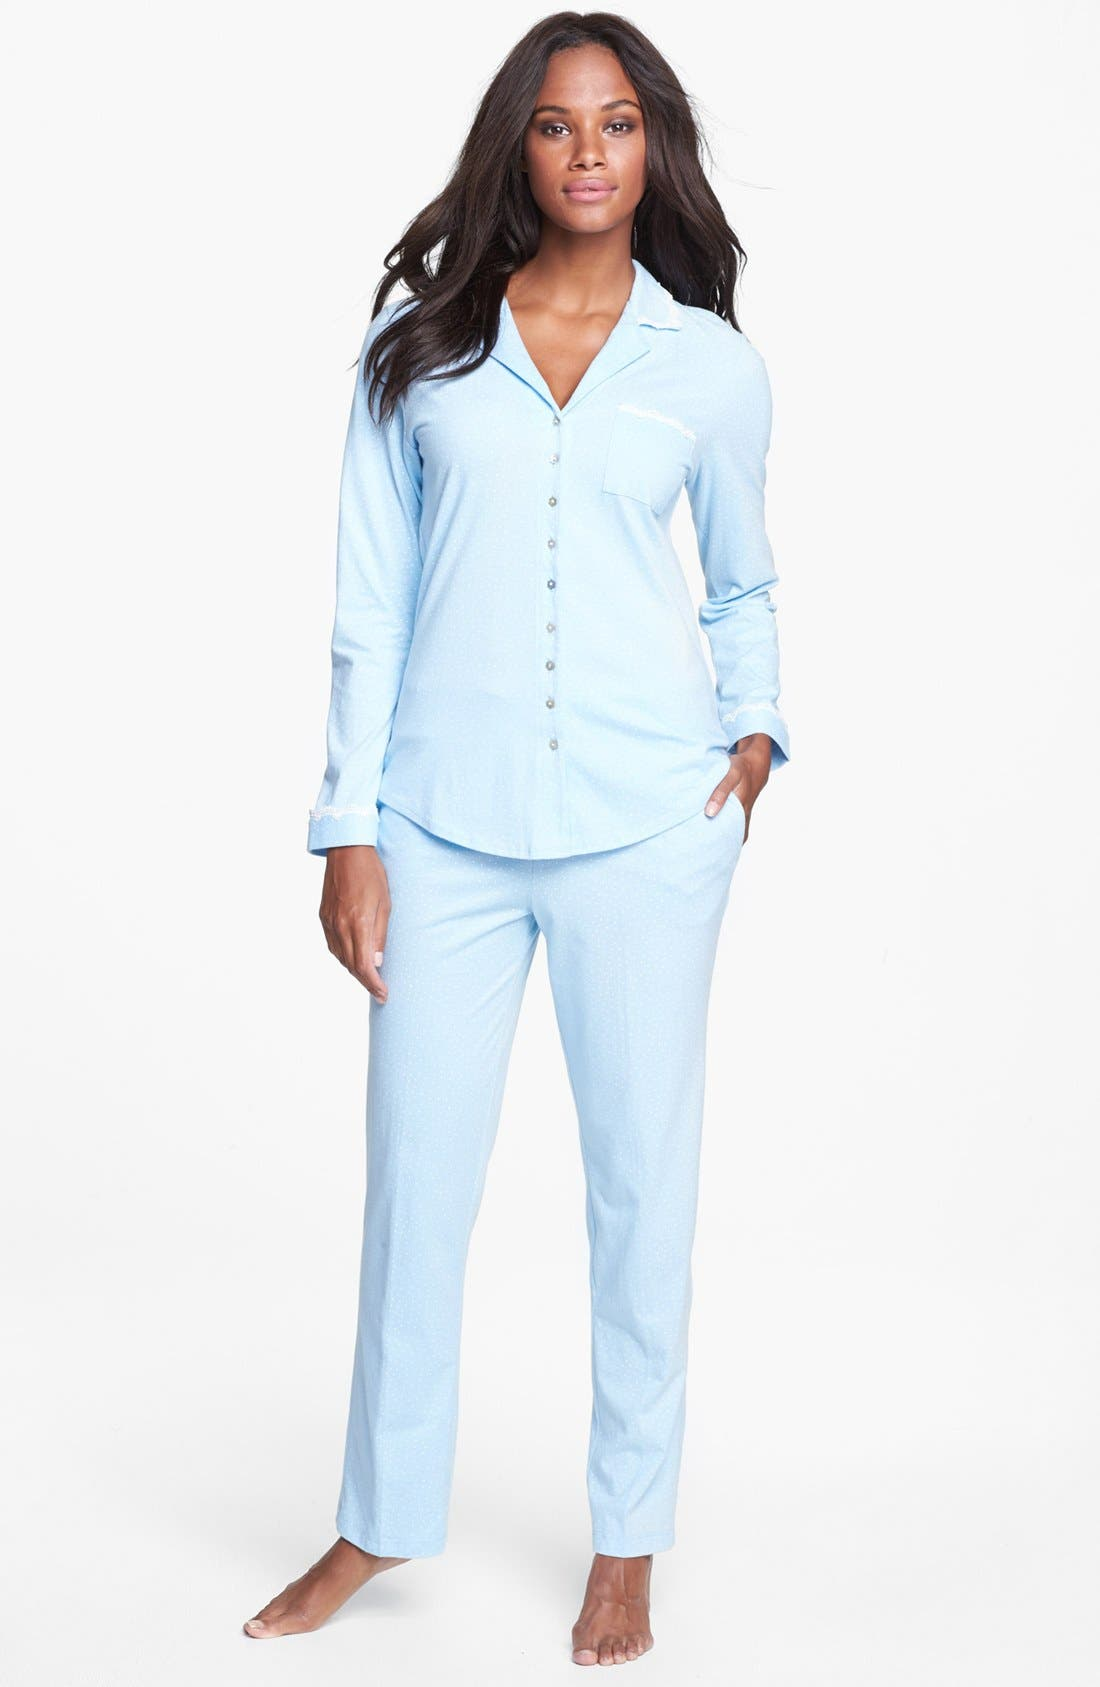 'Buona Notte' Pajamas,                             Main thumbnail 1, color,                             Blue/ Winter White Dots